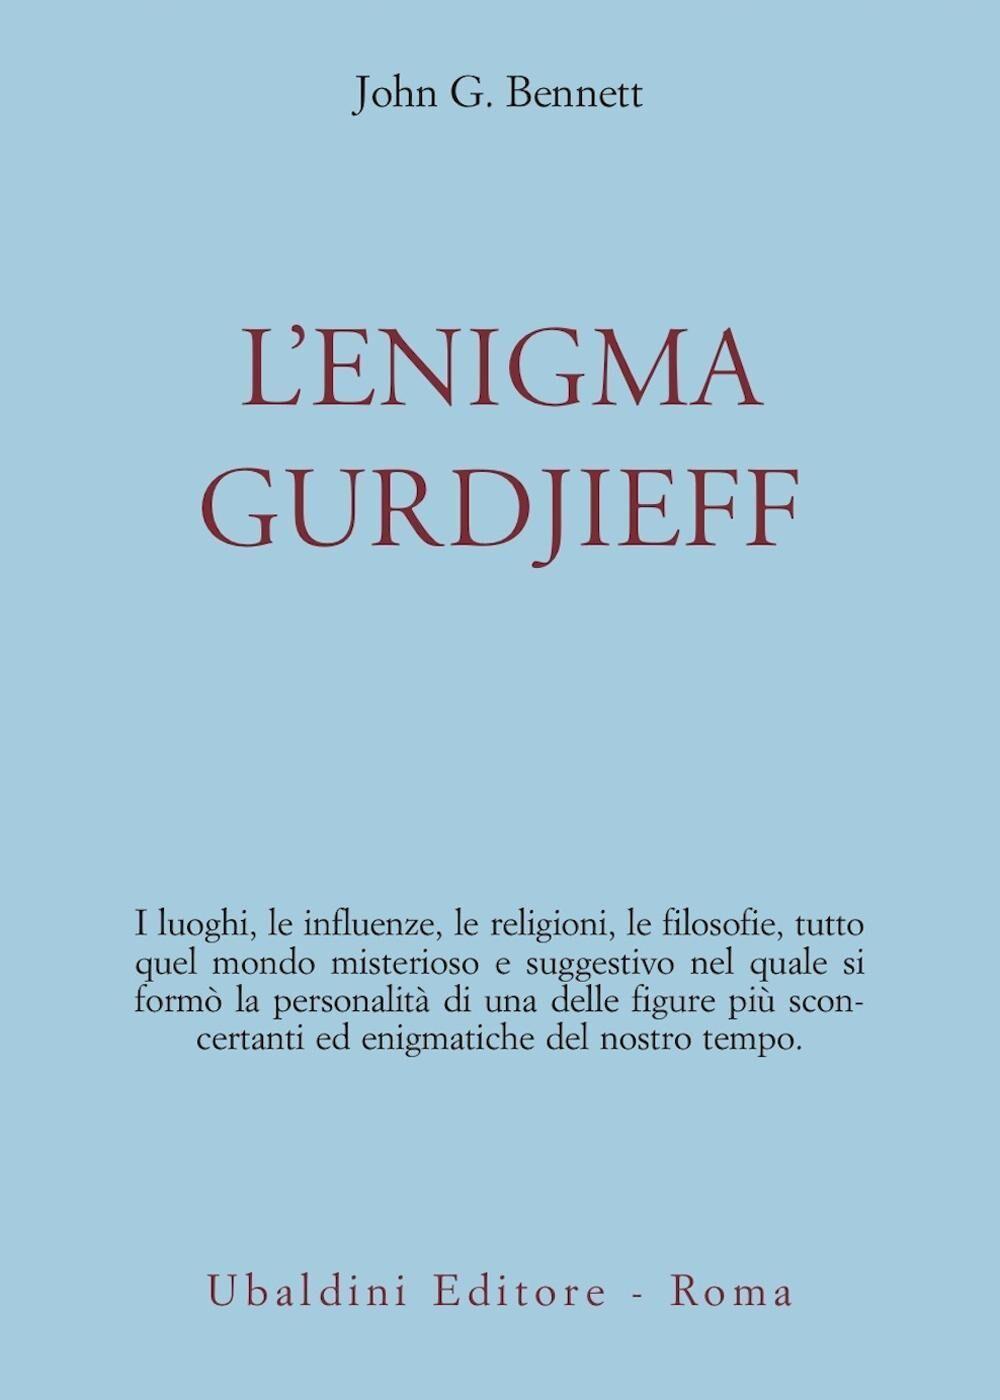 L' enigma Gurdjieff